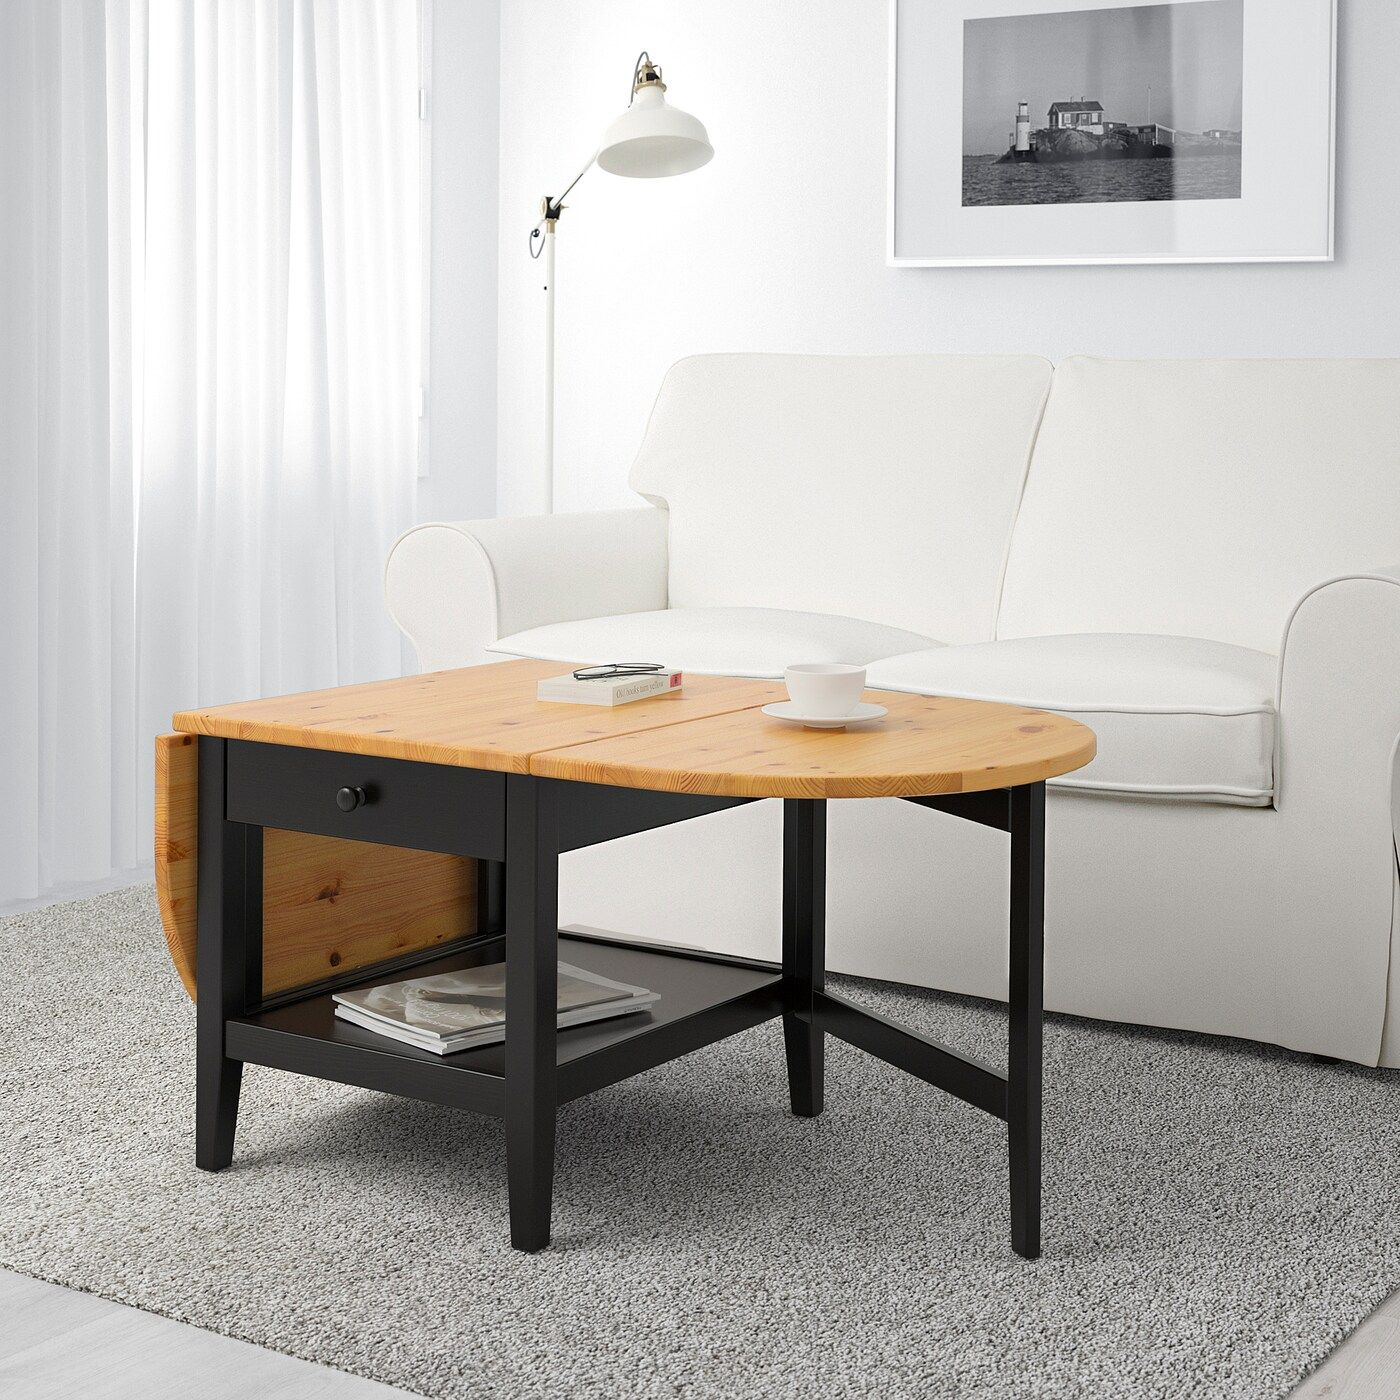 Arkelstorp Coffee Table Black Ikea Ikea Coffee Table Coffee Table Extendable Coffee Table [ 1400 x 1400 Pixel ]